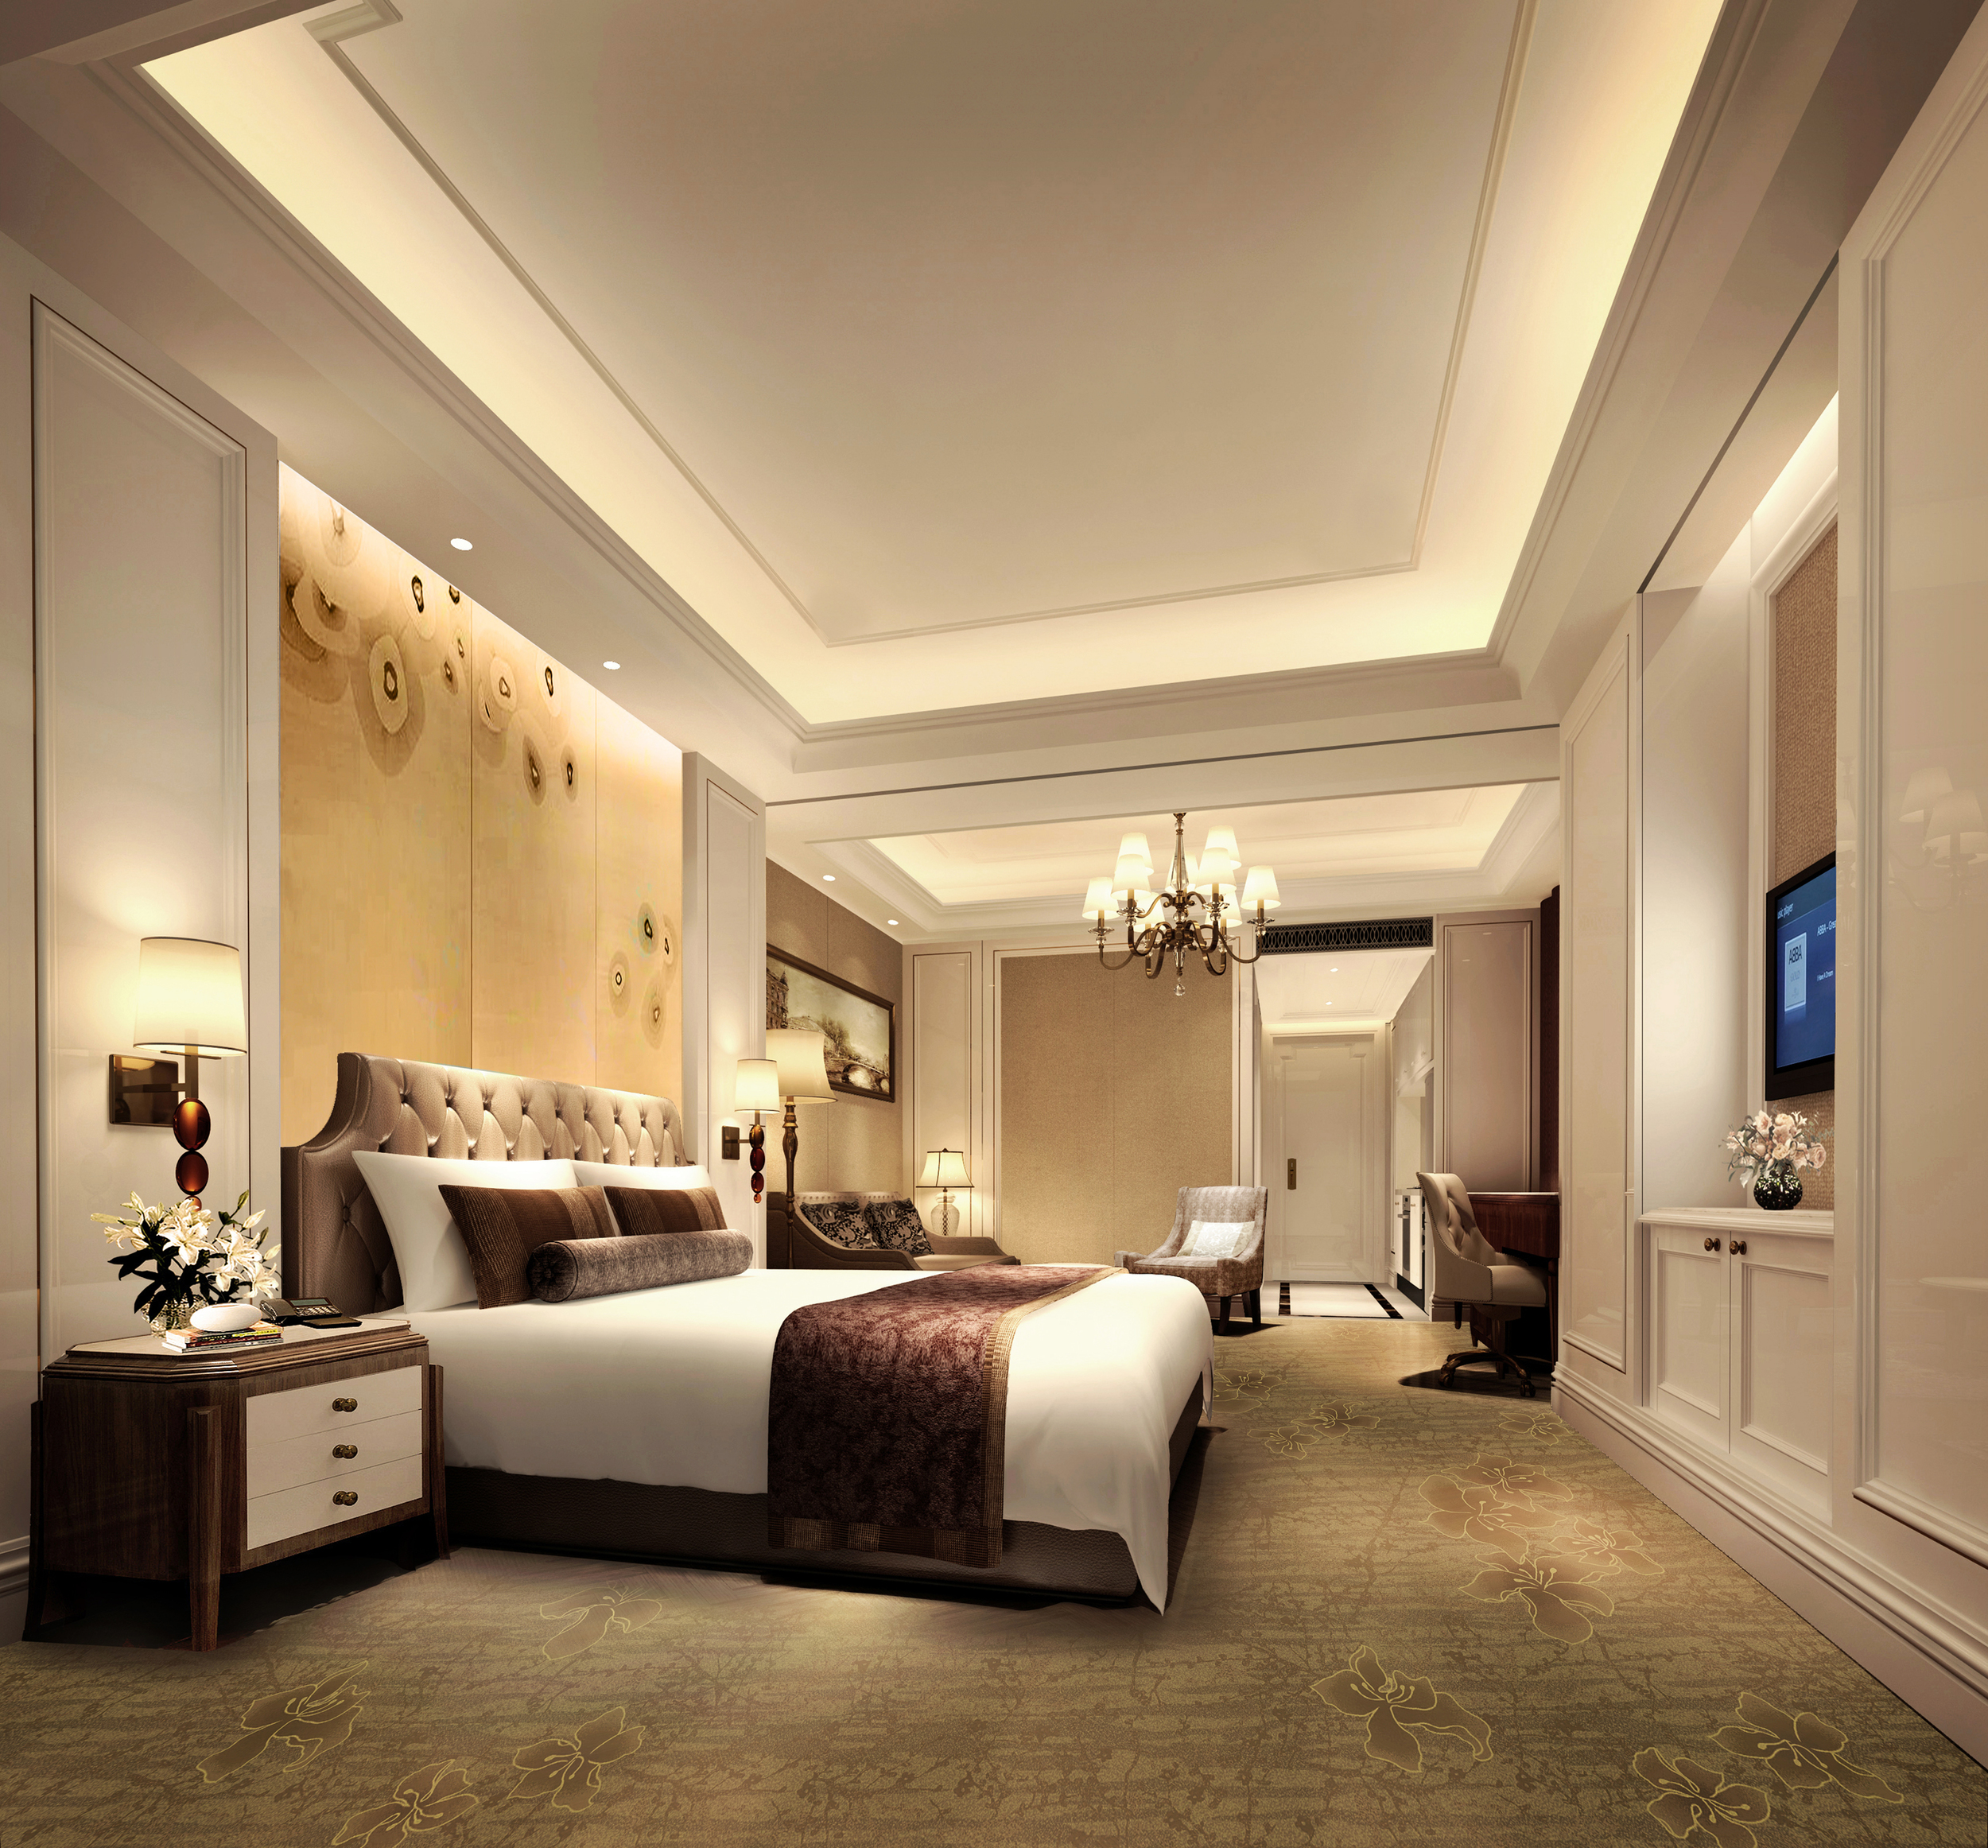 New Rooms at the Sofitel Xining. Photo Credit: Sofitel Xining